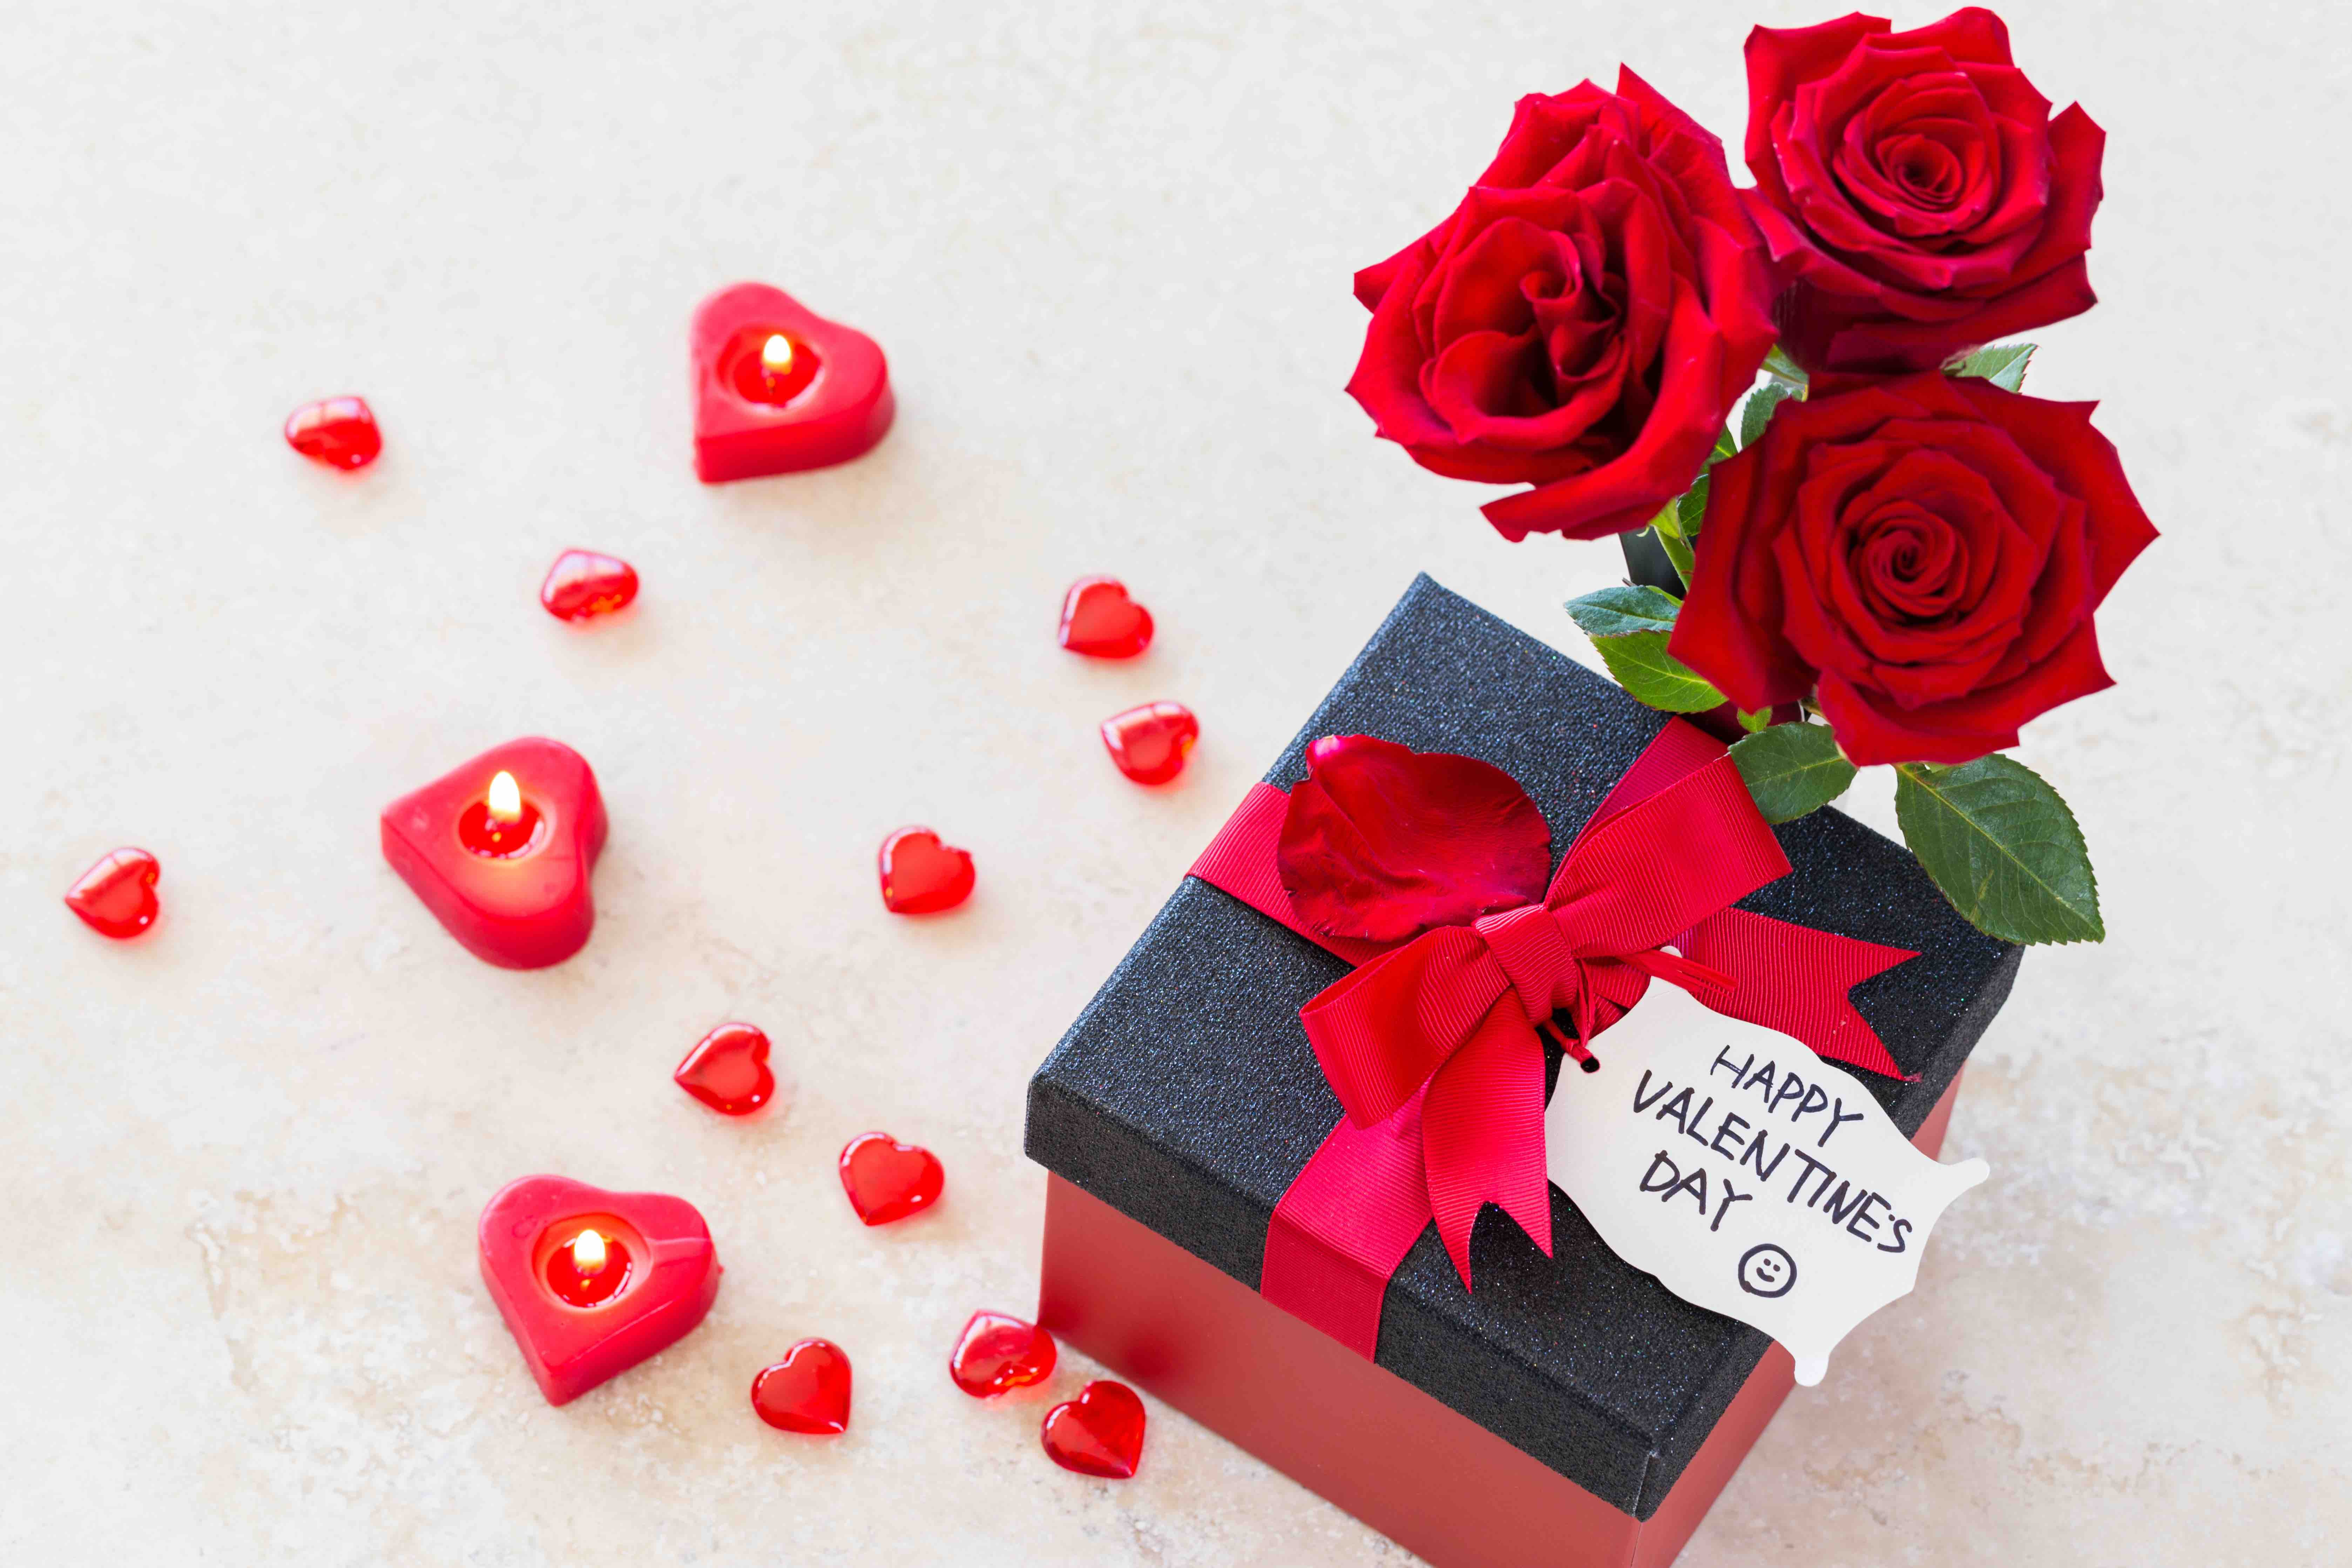 Polyurethane S Valentine S Day Gift List Incredible Polyurethane